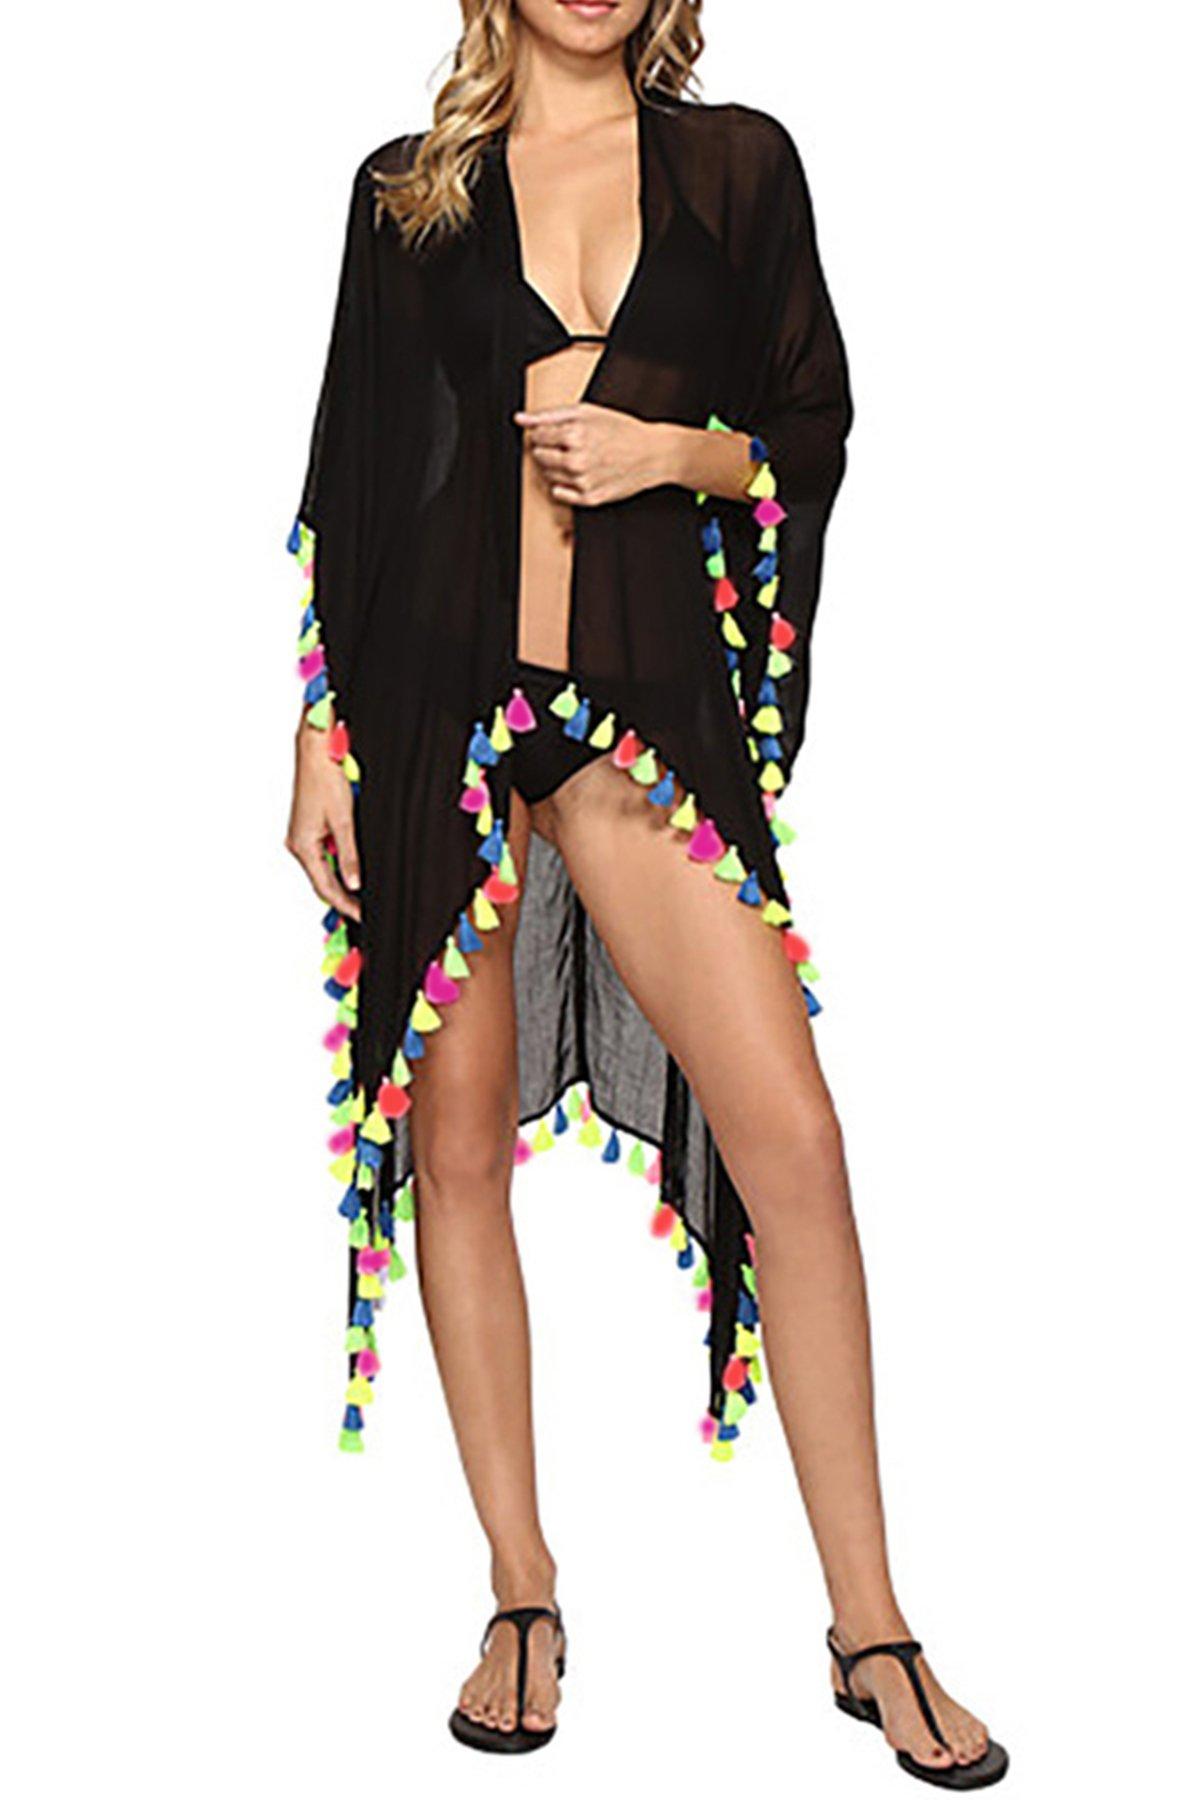 JOXJOZ Women's Chiffon Tassels Summer Beach Cardigan Swimsuit Cover-Ups Swimwear Beachwear (Black)